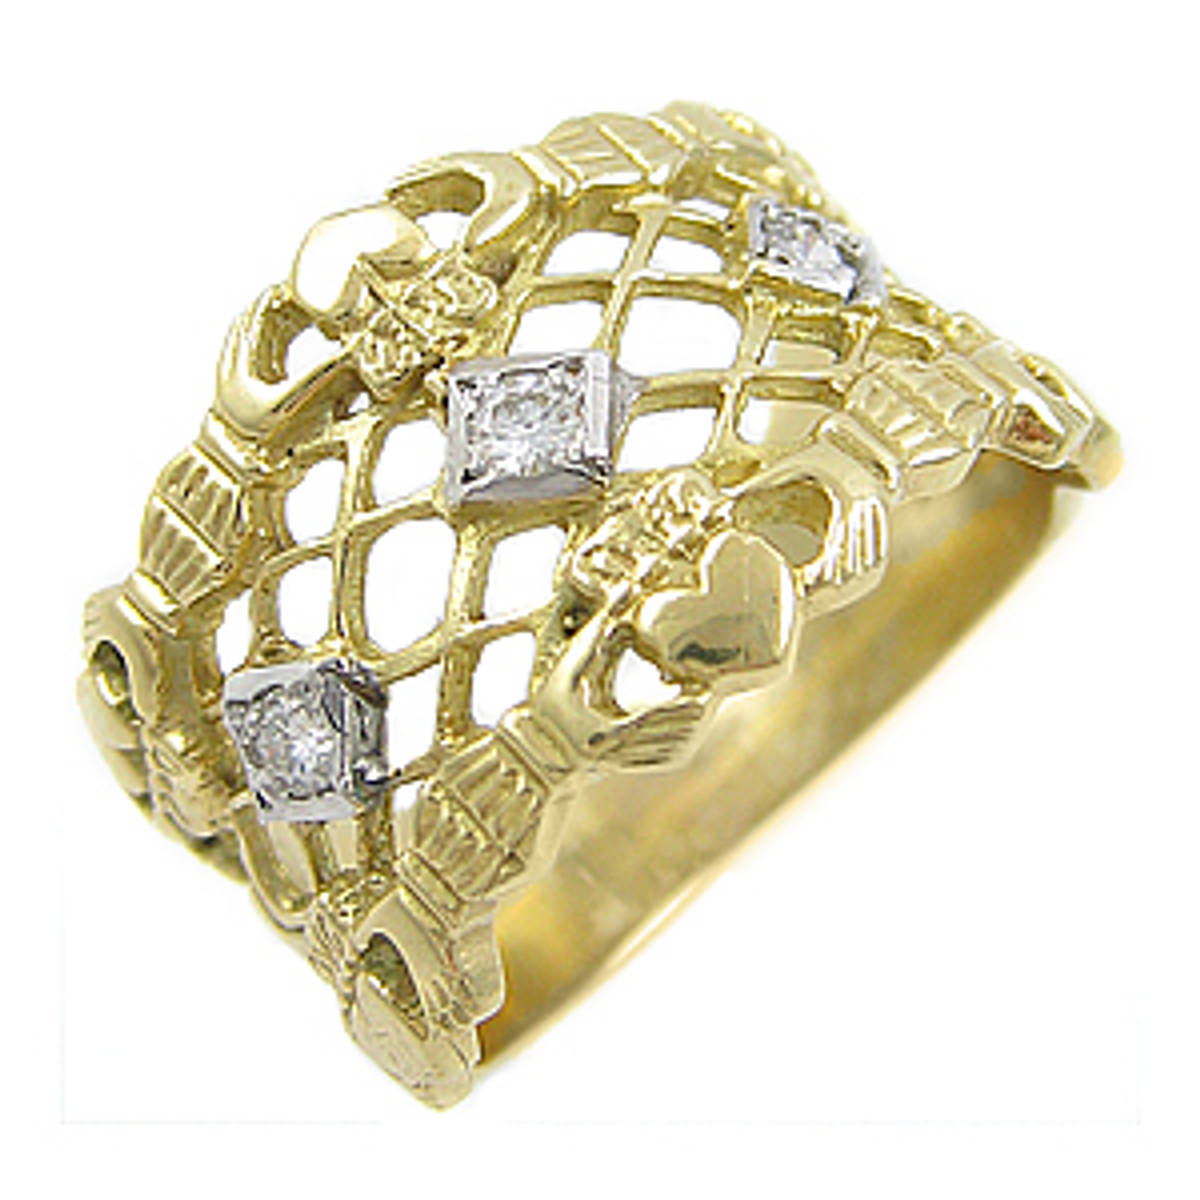 Irish made14 carat yellow gold 0.10cts diamonds claddagh wedding ring